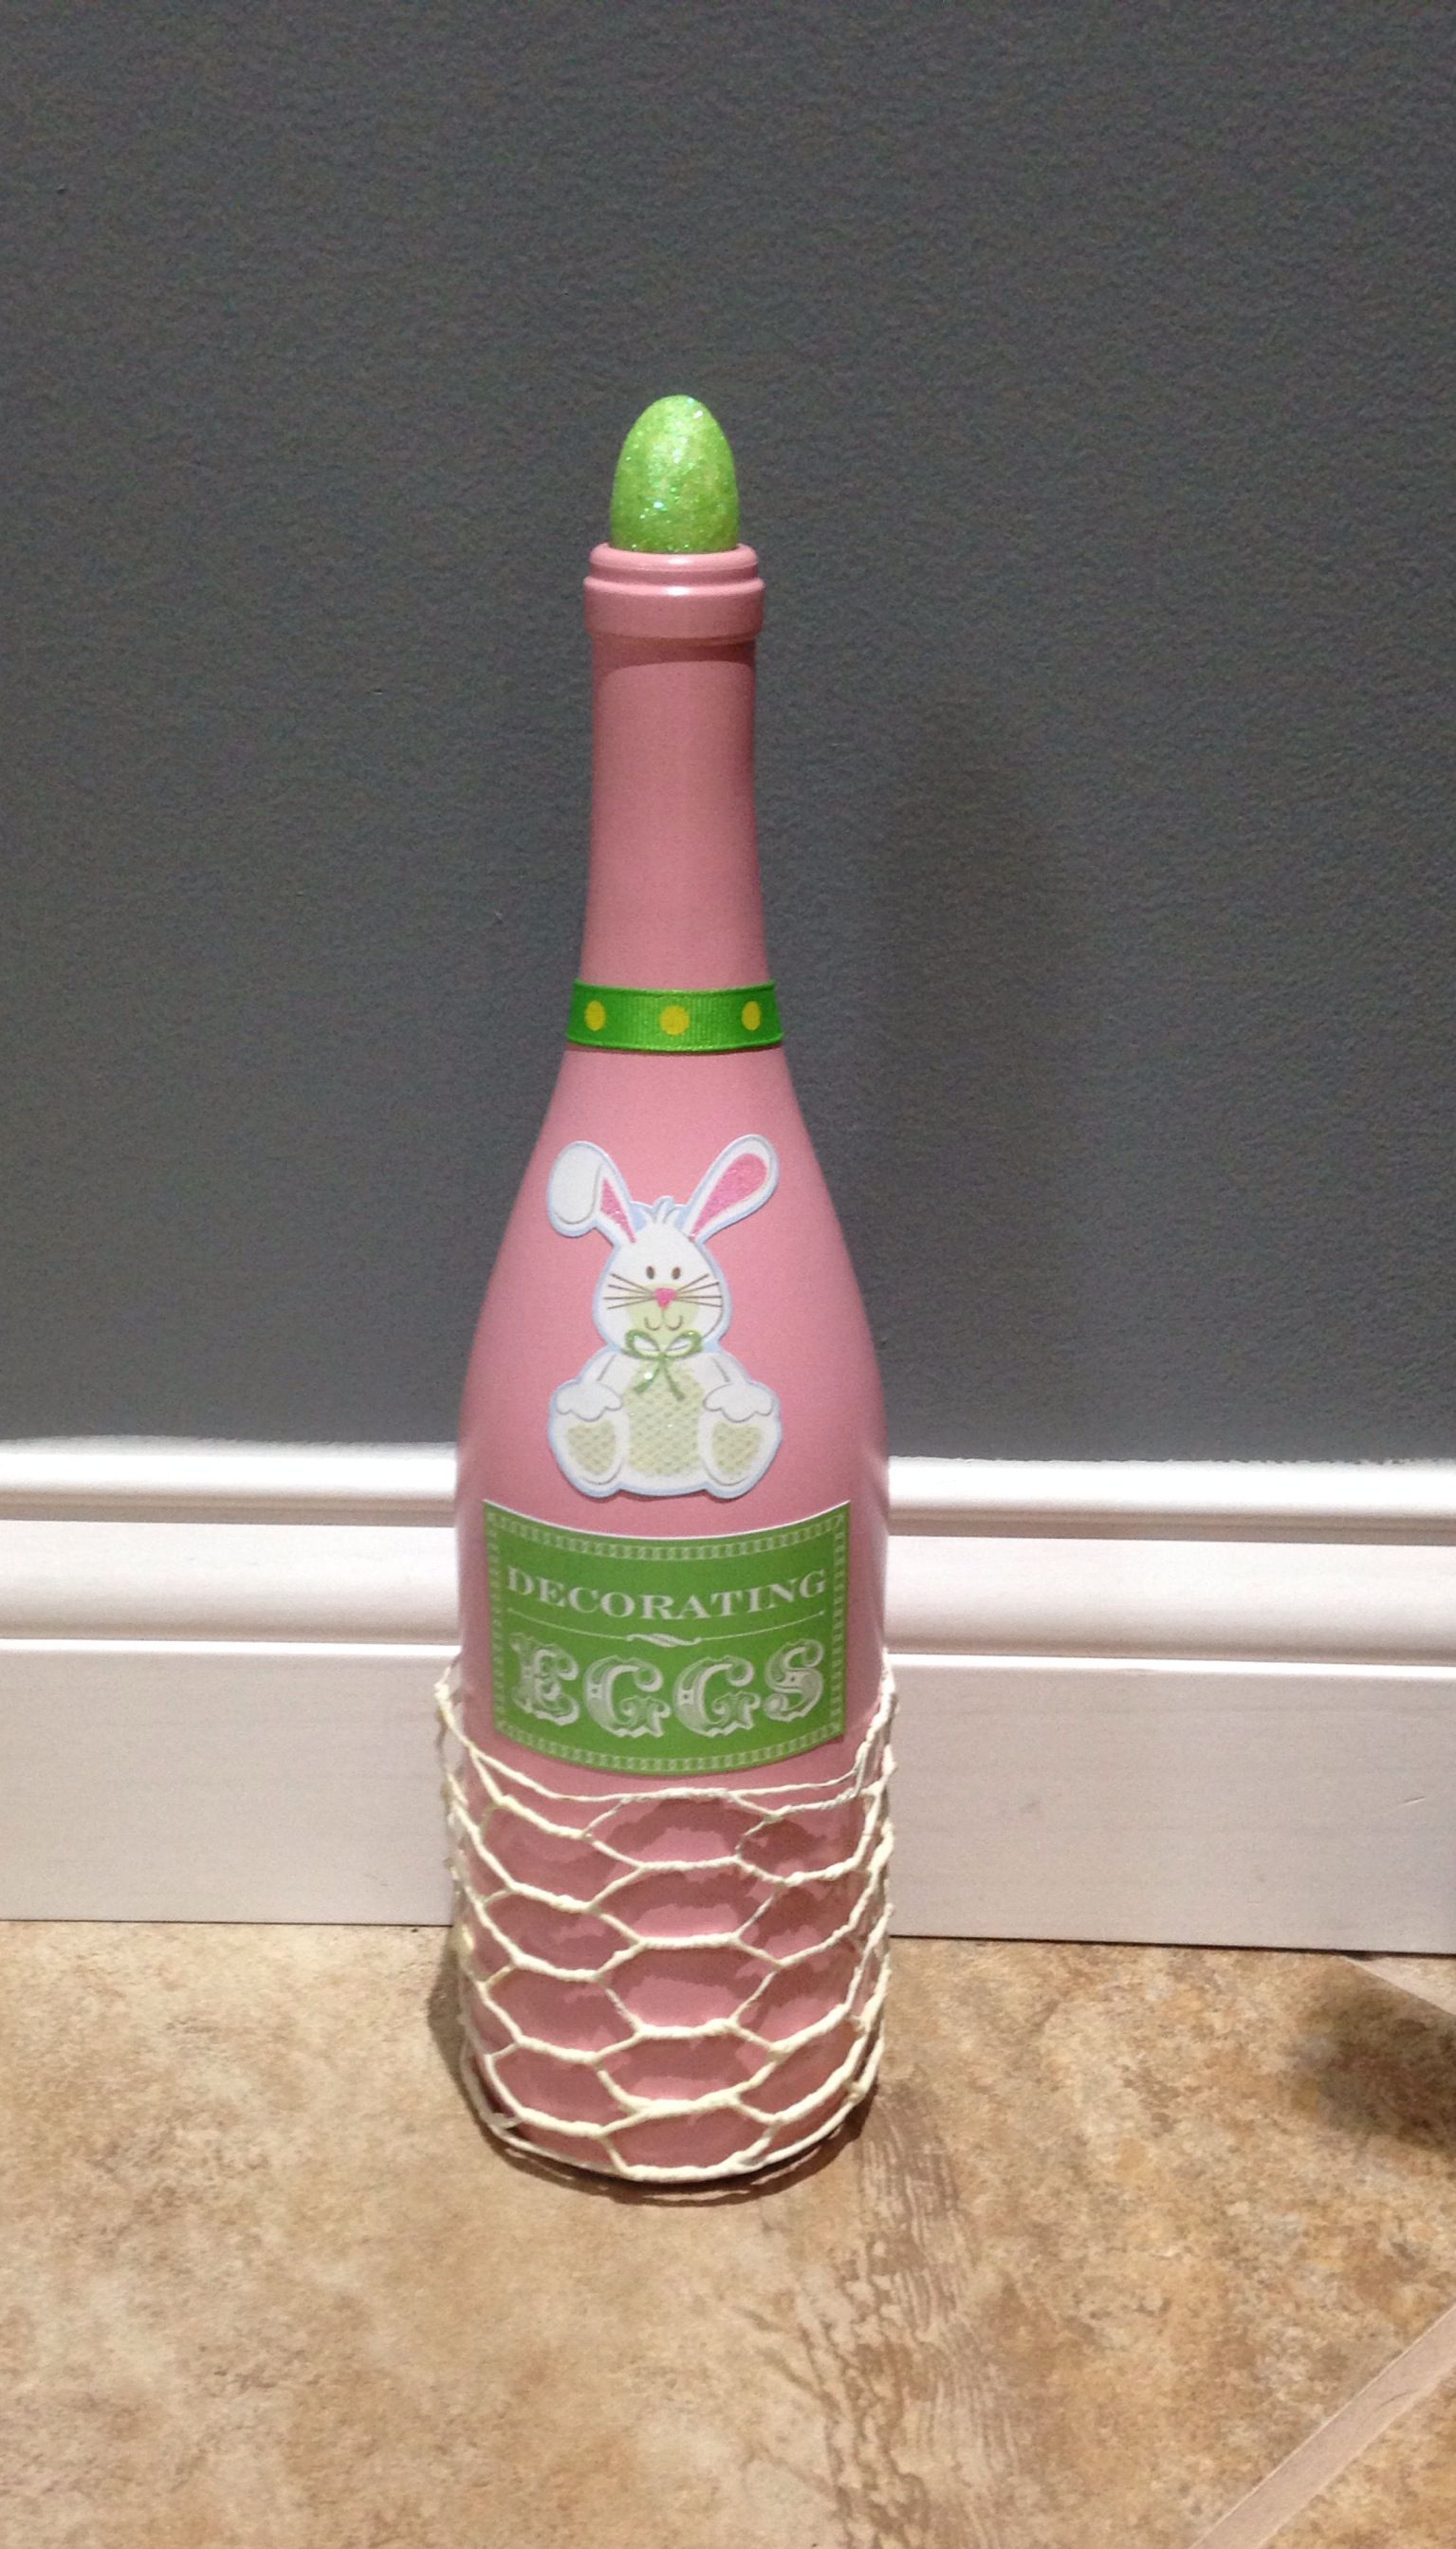 easter wine bottle decor diy chicken wire glitter egg pink green wine decorations. Black Bedroom Furniture Sets. Home Design Ideas